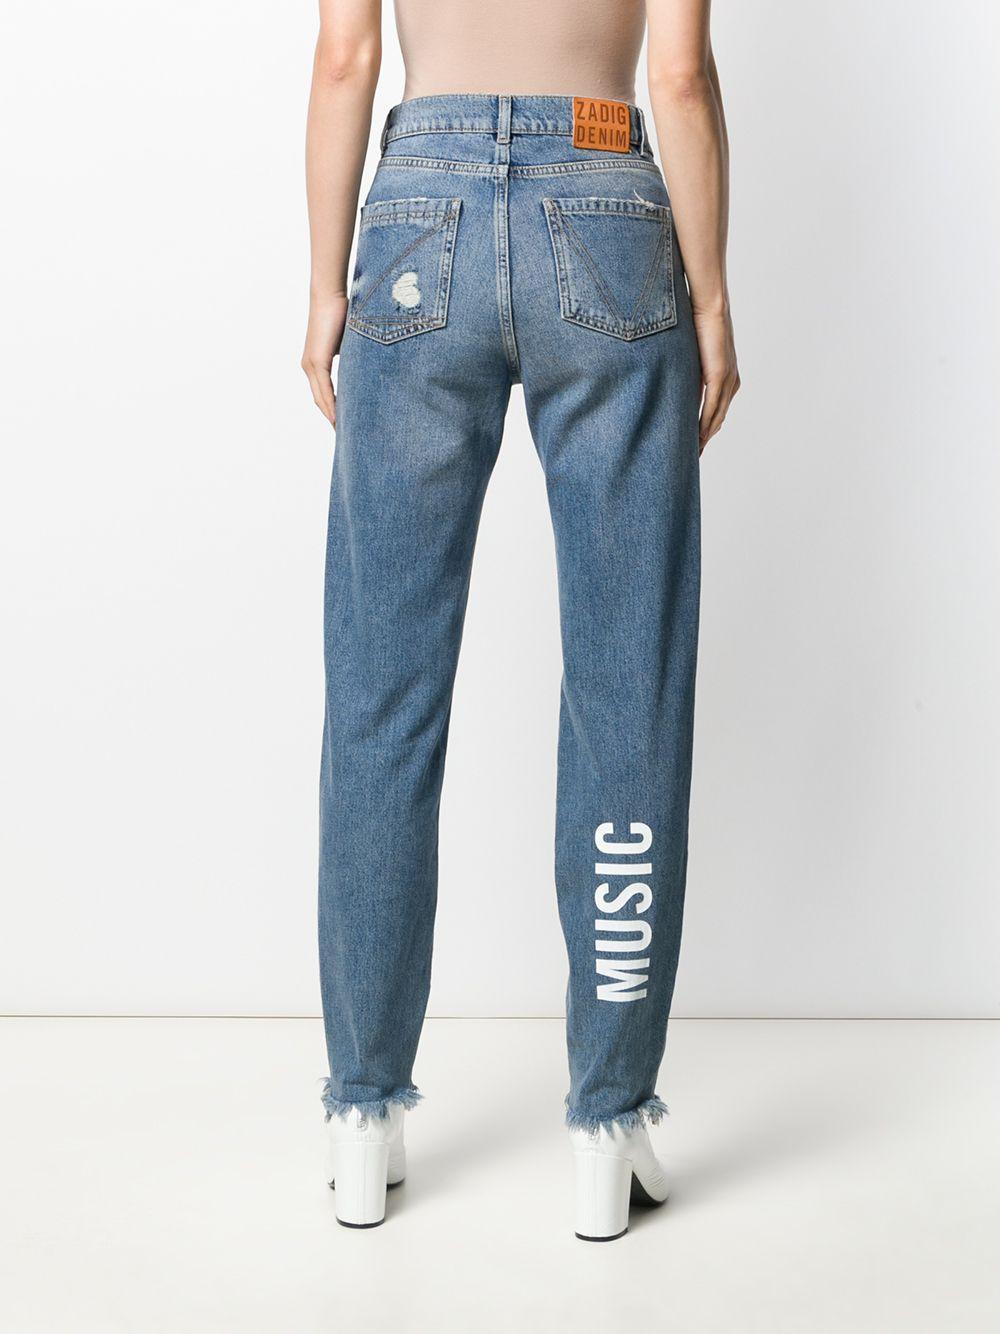 Zadig & Voltaire Denim Mom-Jeans im Distressed-Look in Blau Qtac2